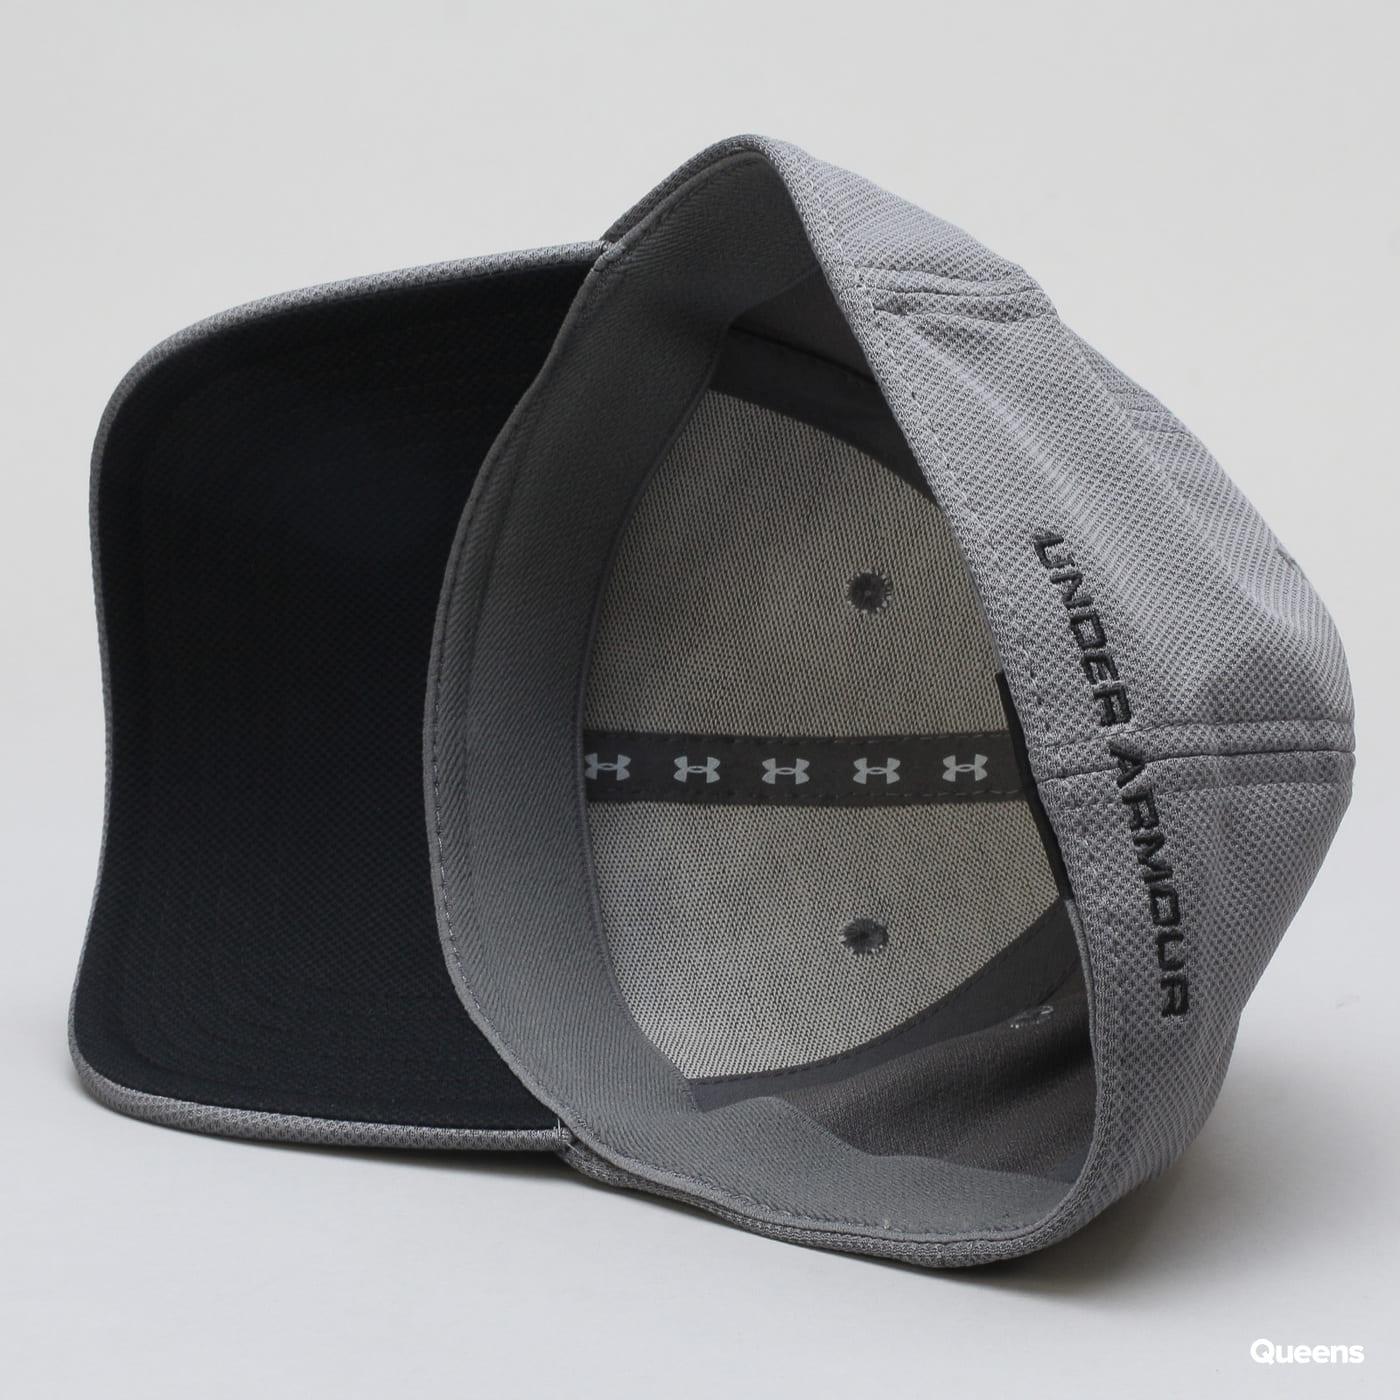 Under Armour Men's Blitzing 3.0 Cap grau / schwarz